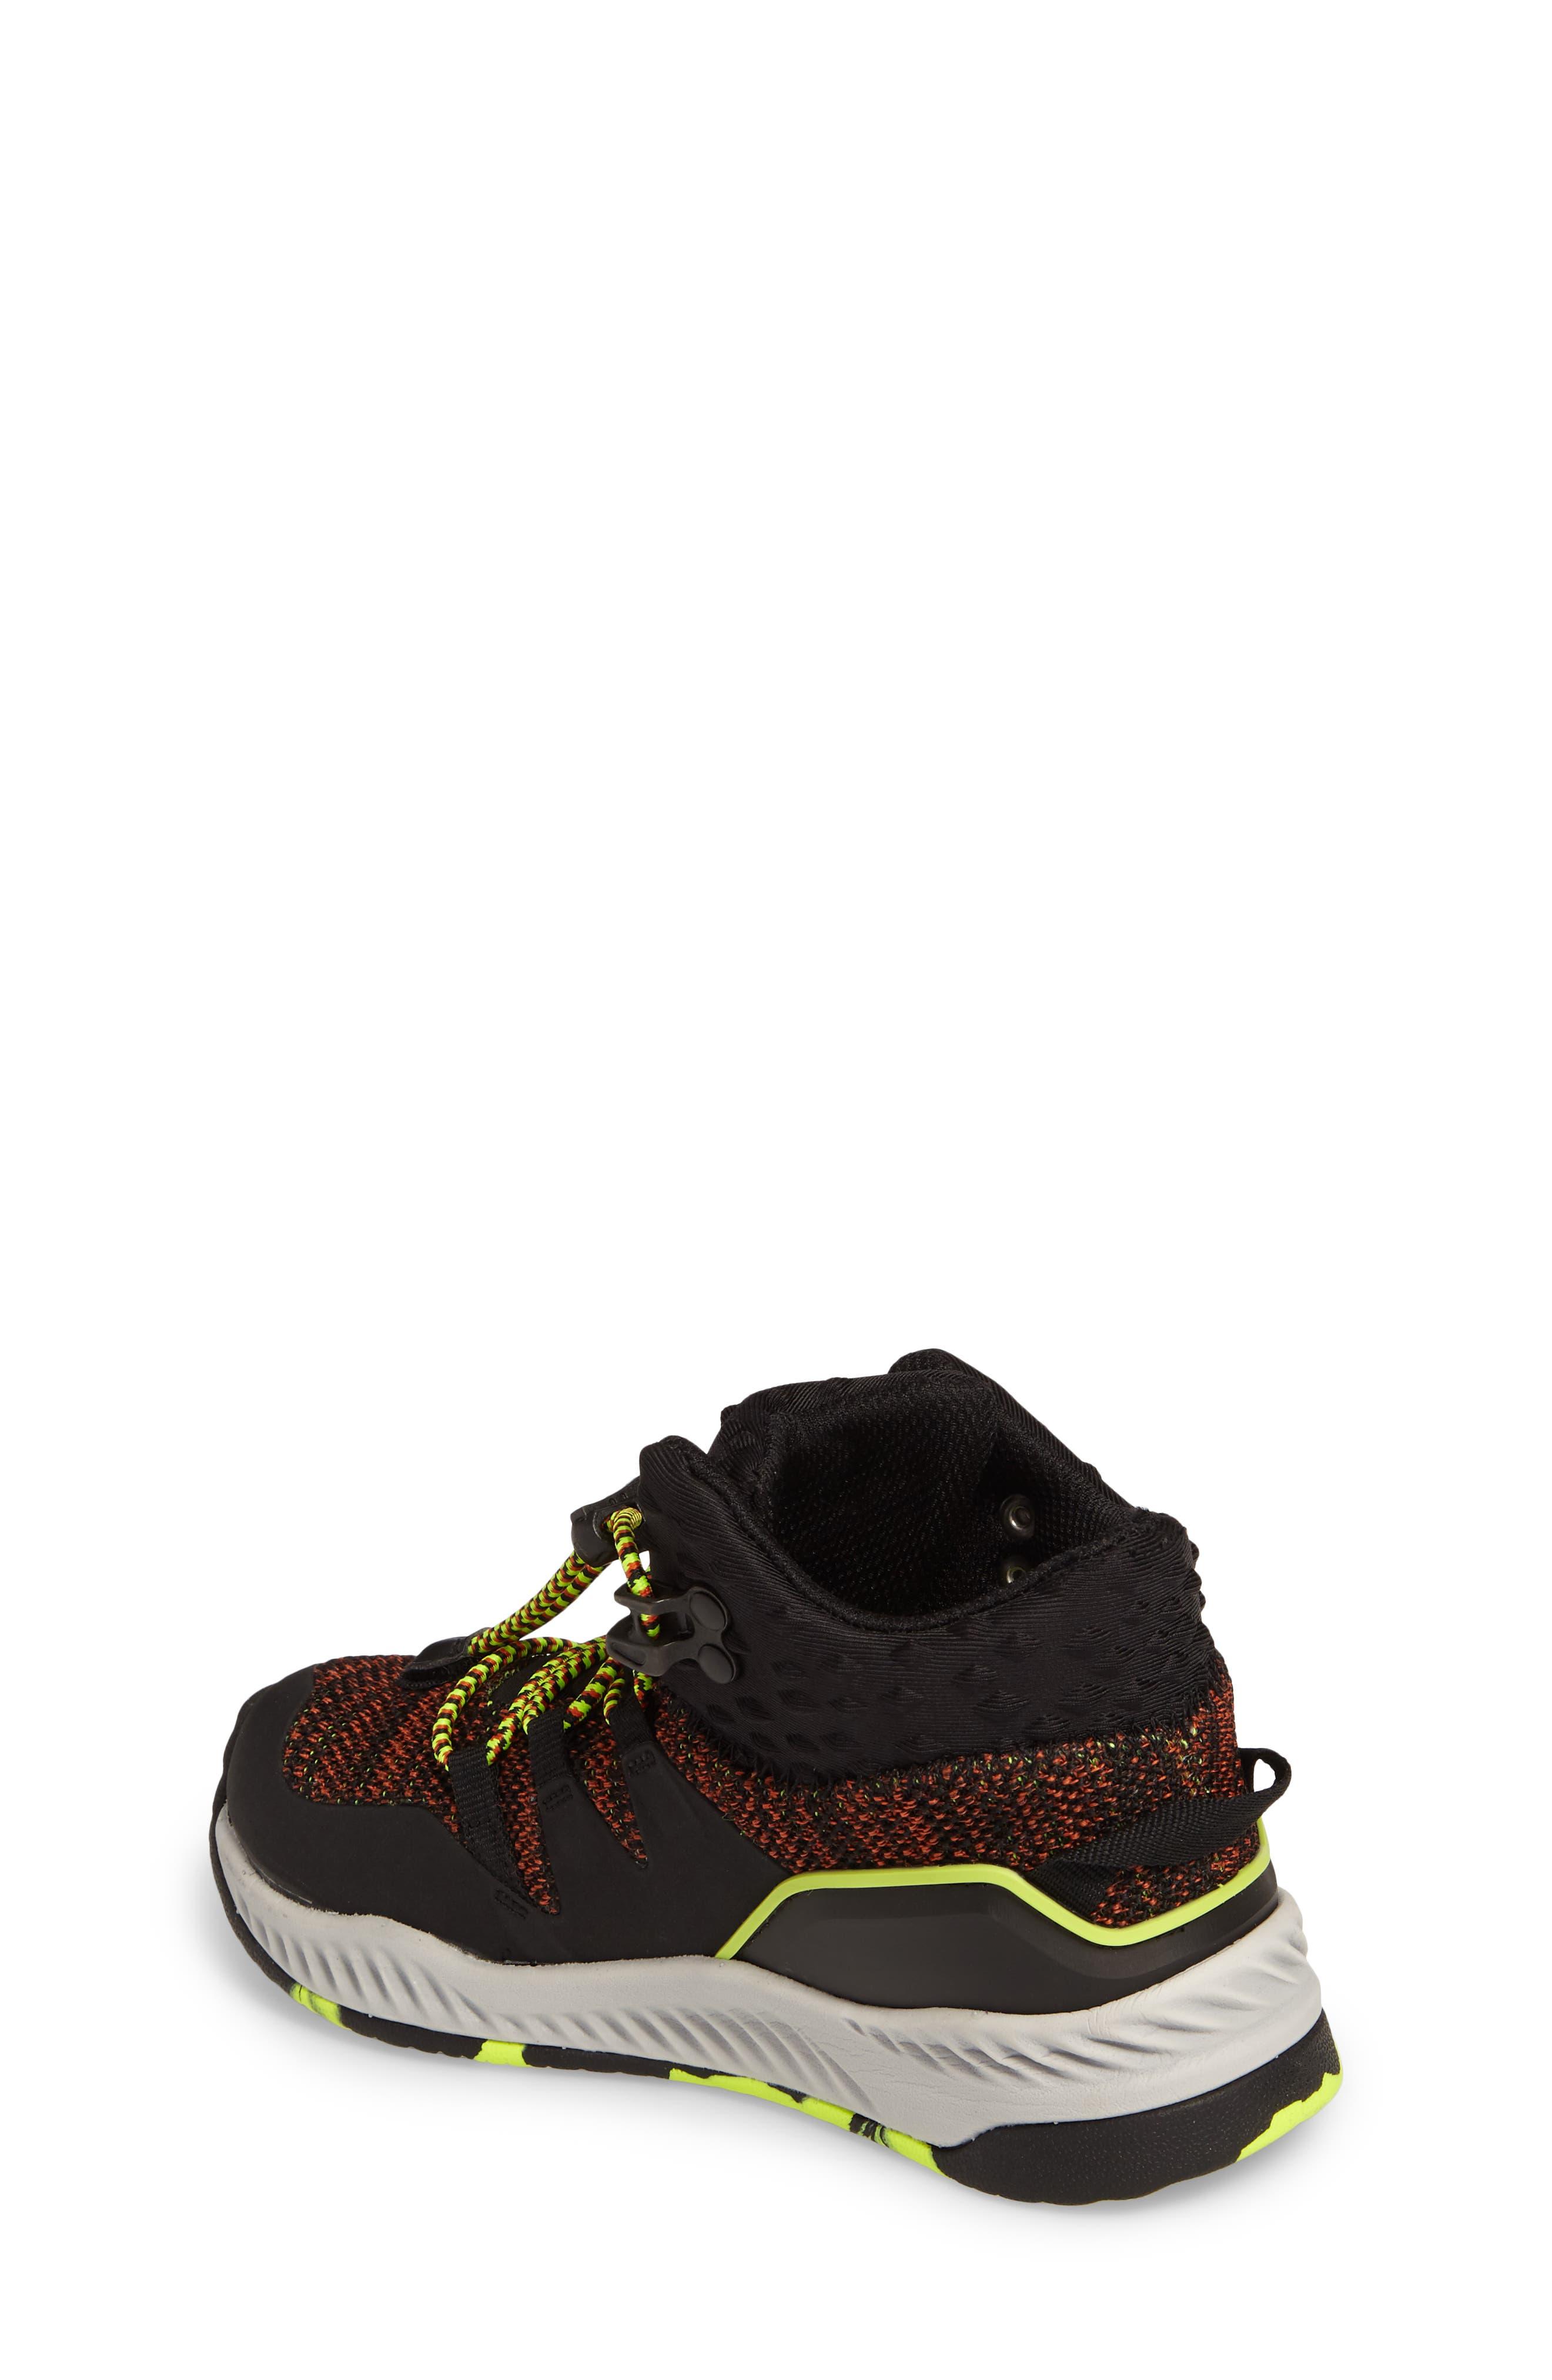 Armadillo Sneaker Boot,                             Alternate thumbnail 2, color,                             001